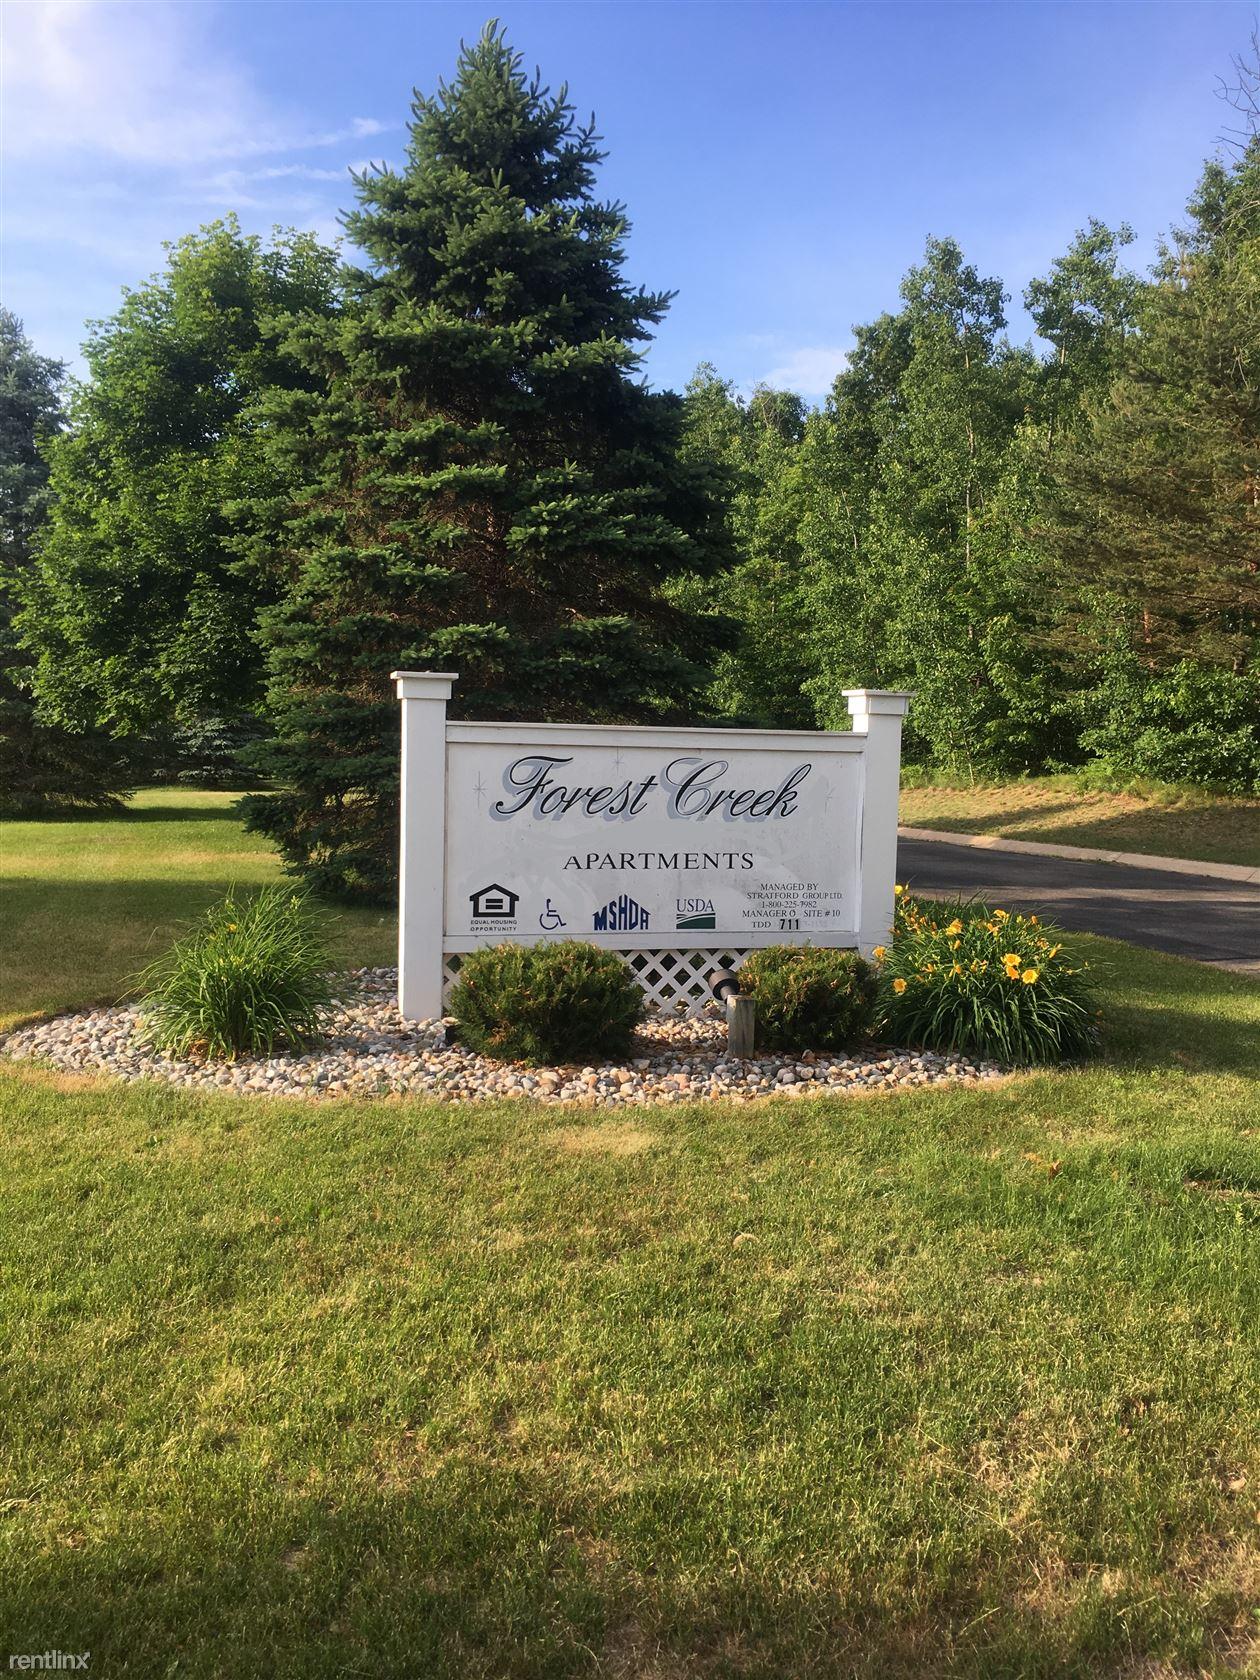 286 Clark St, Montrose, MI - Rent Based On Income